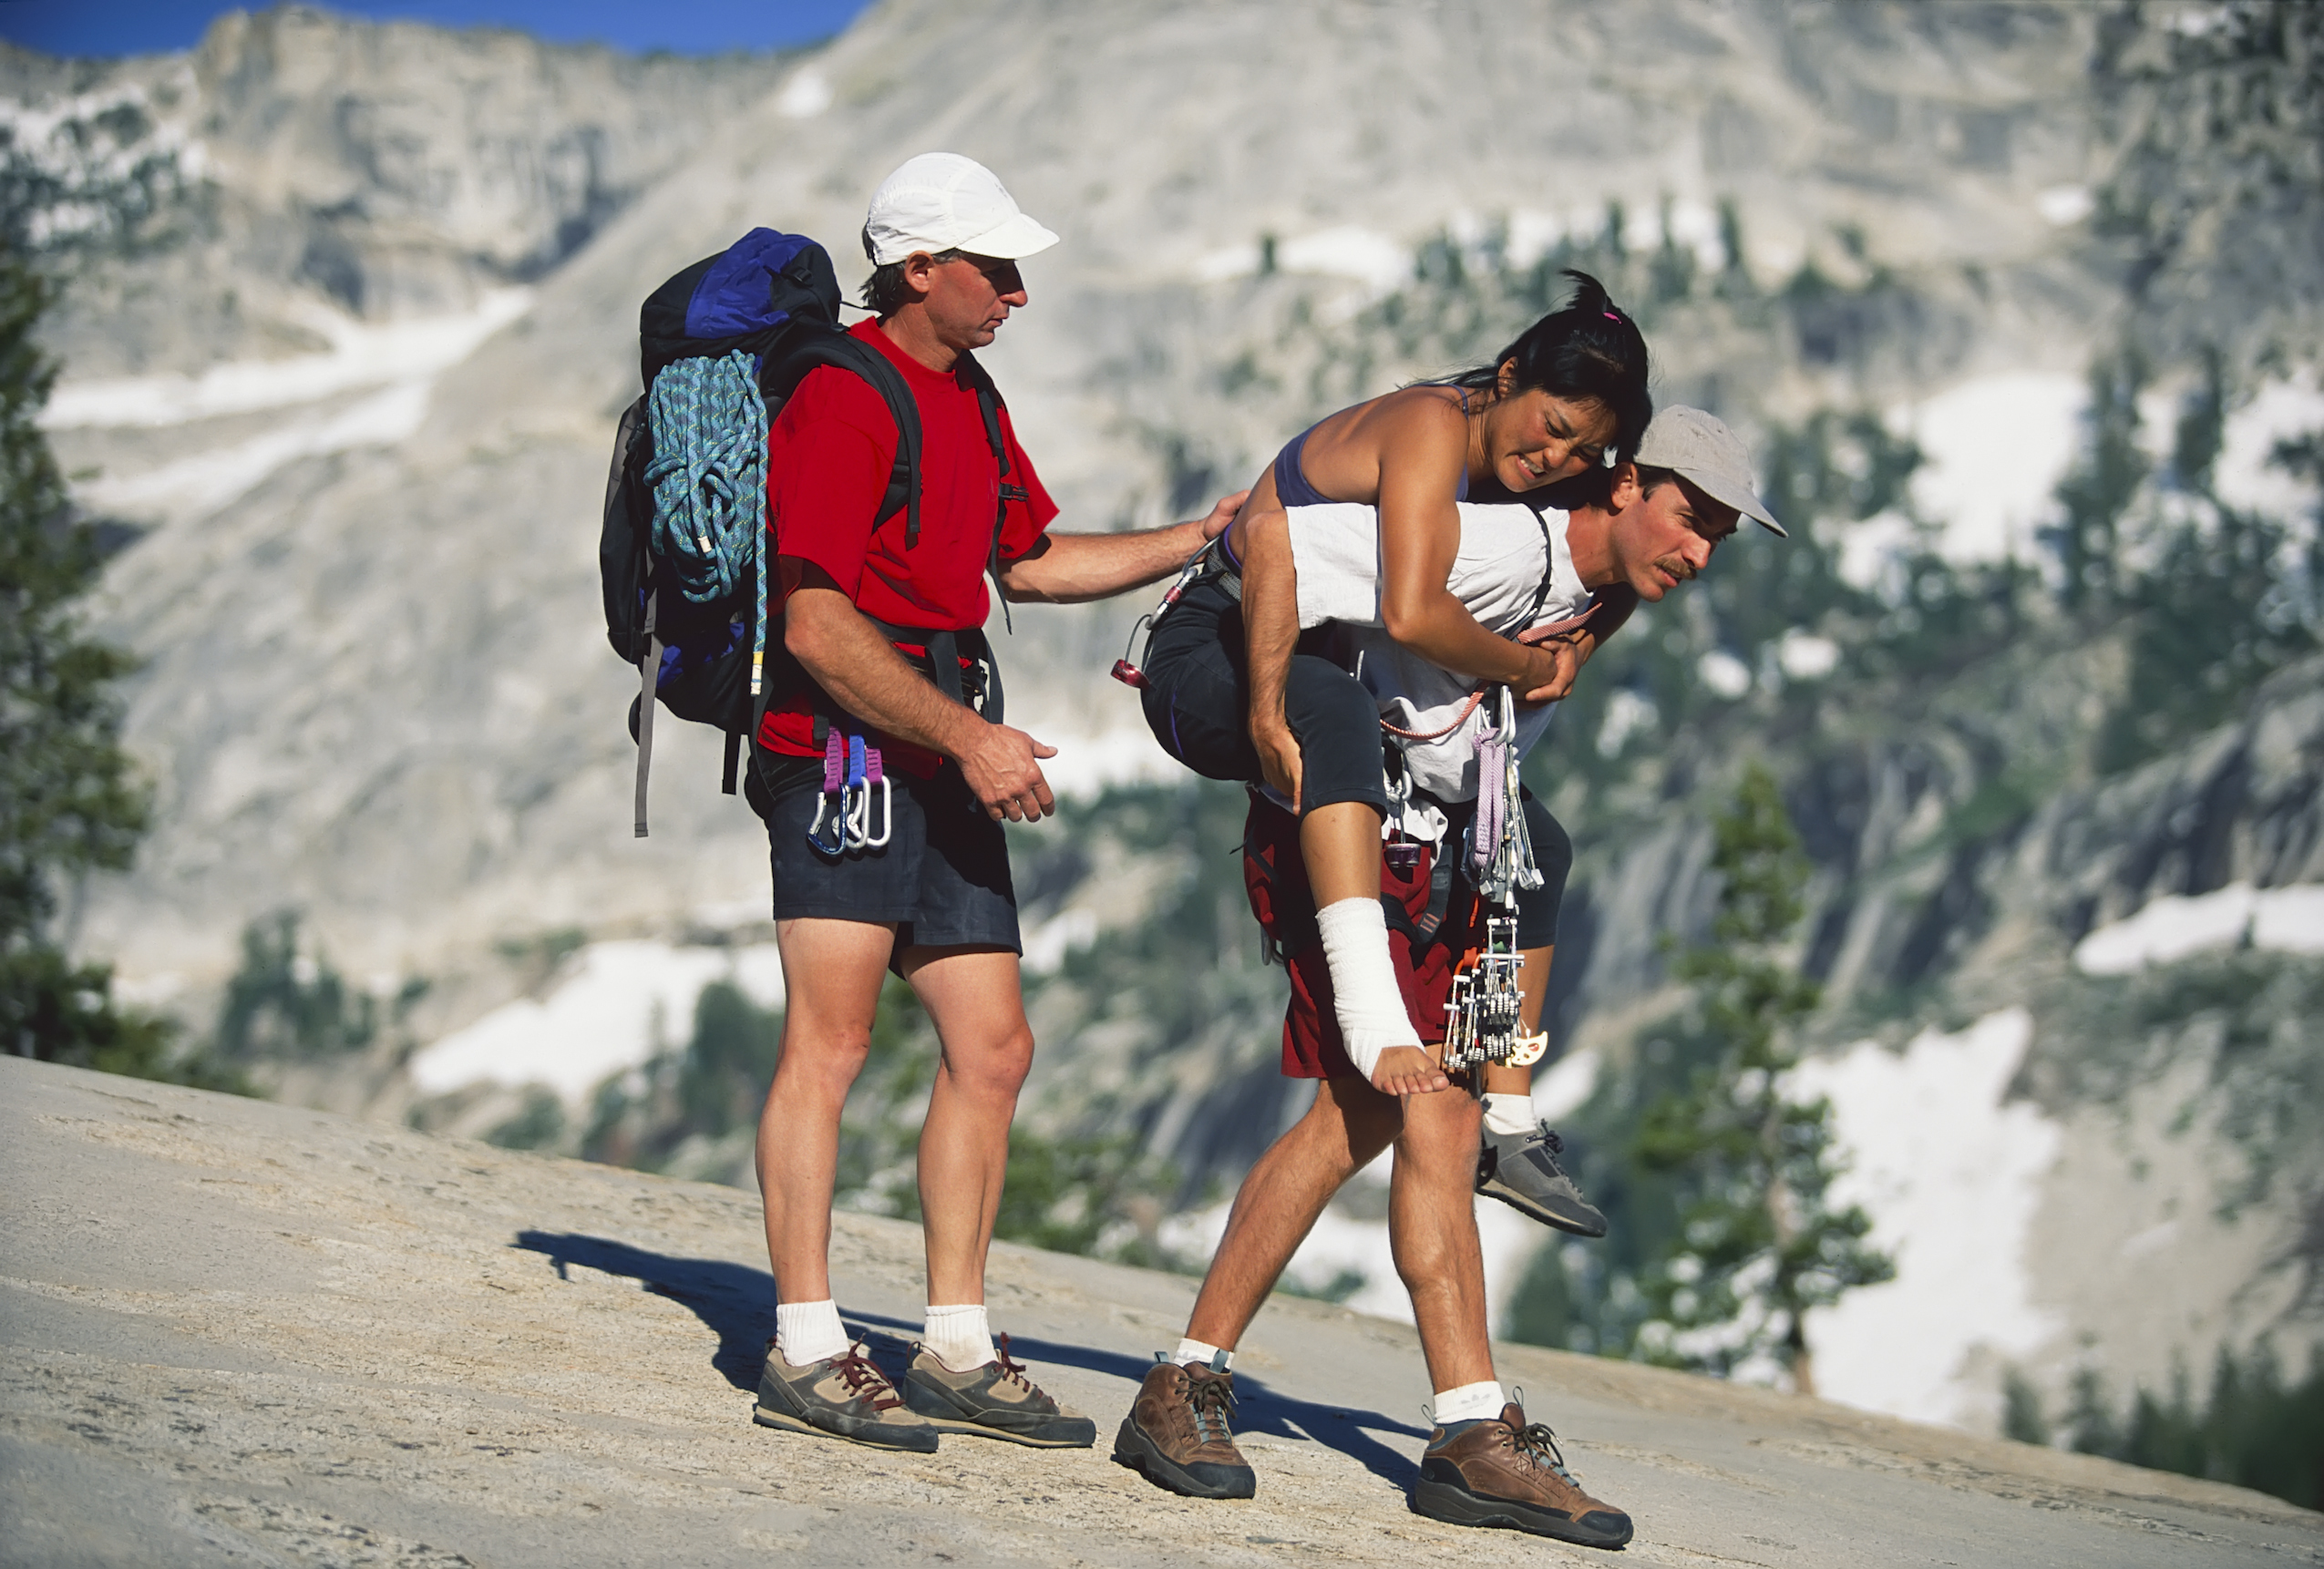 climbingaccident.jpg